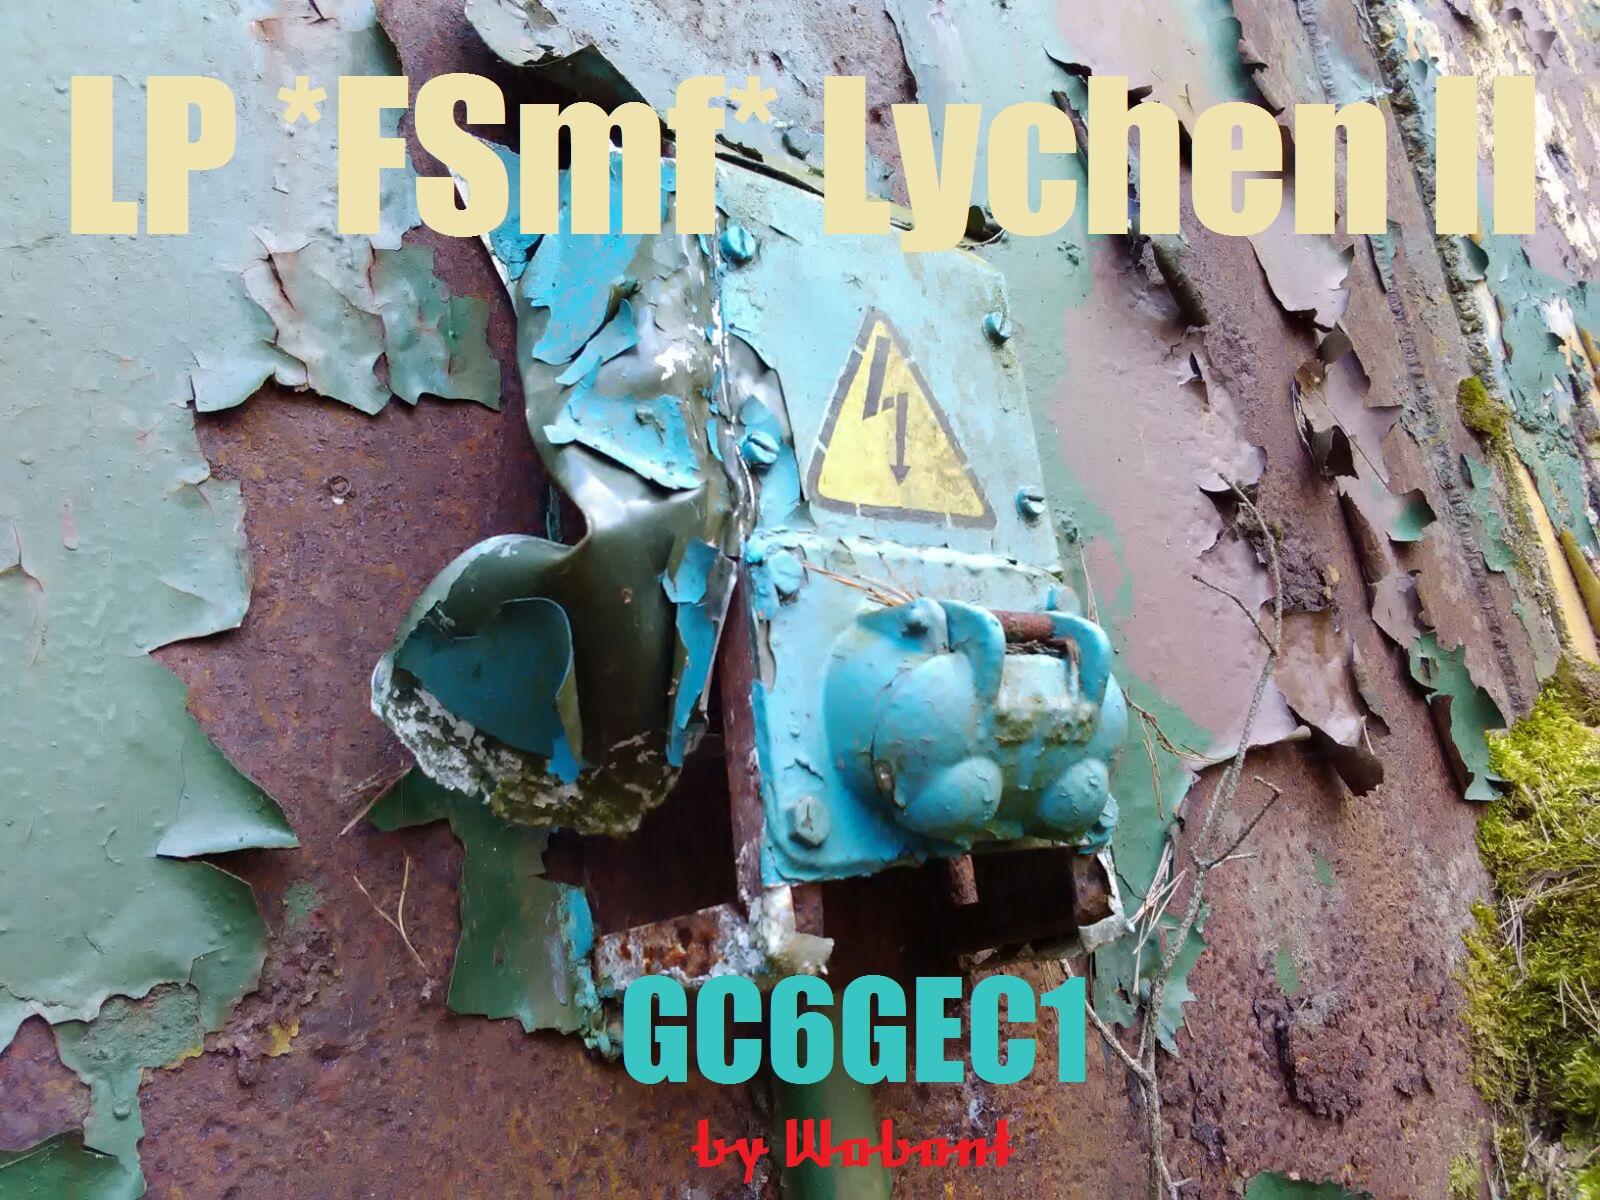 LP *FSmf* Lychen II